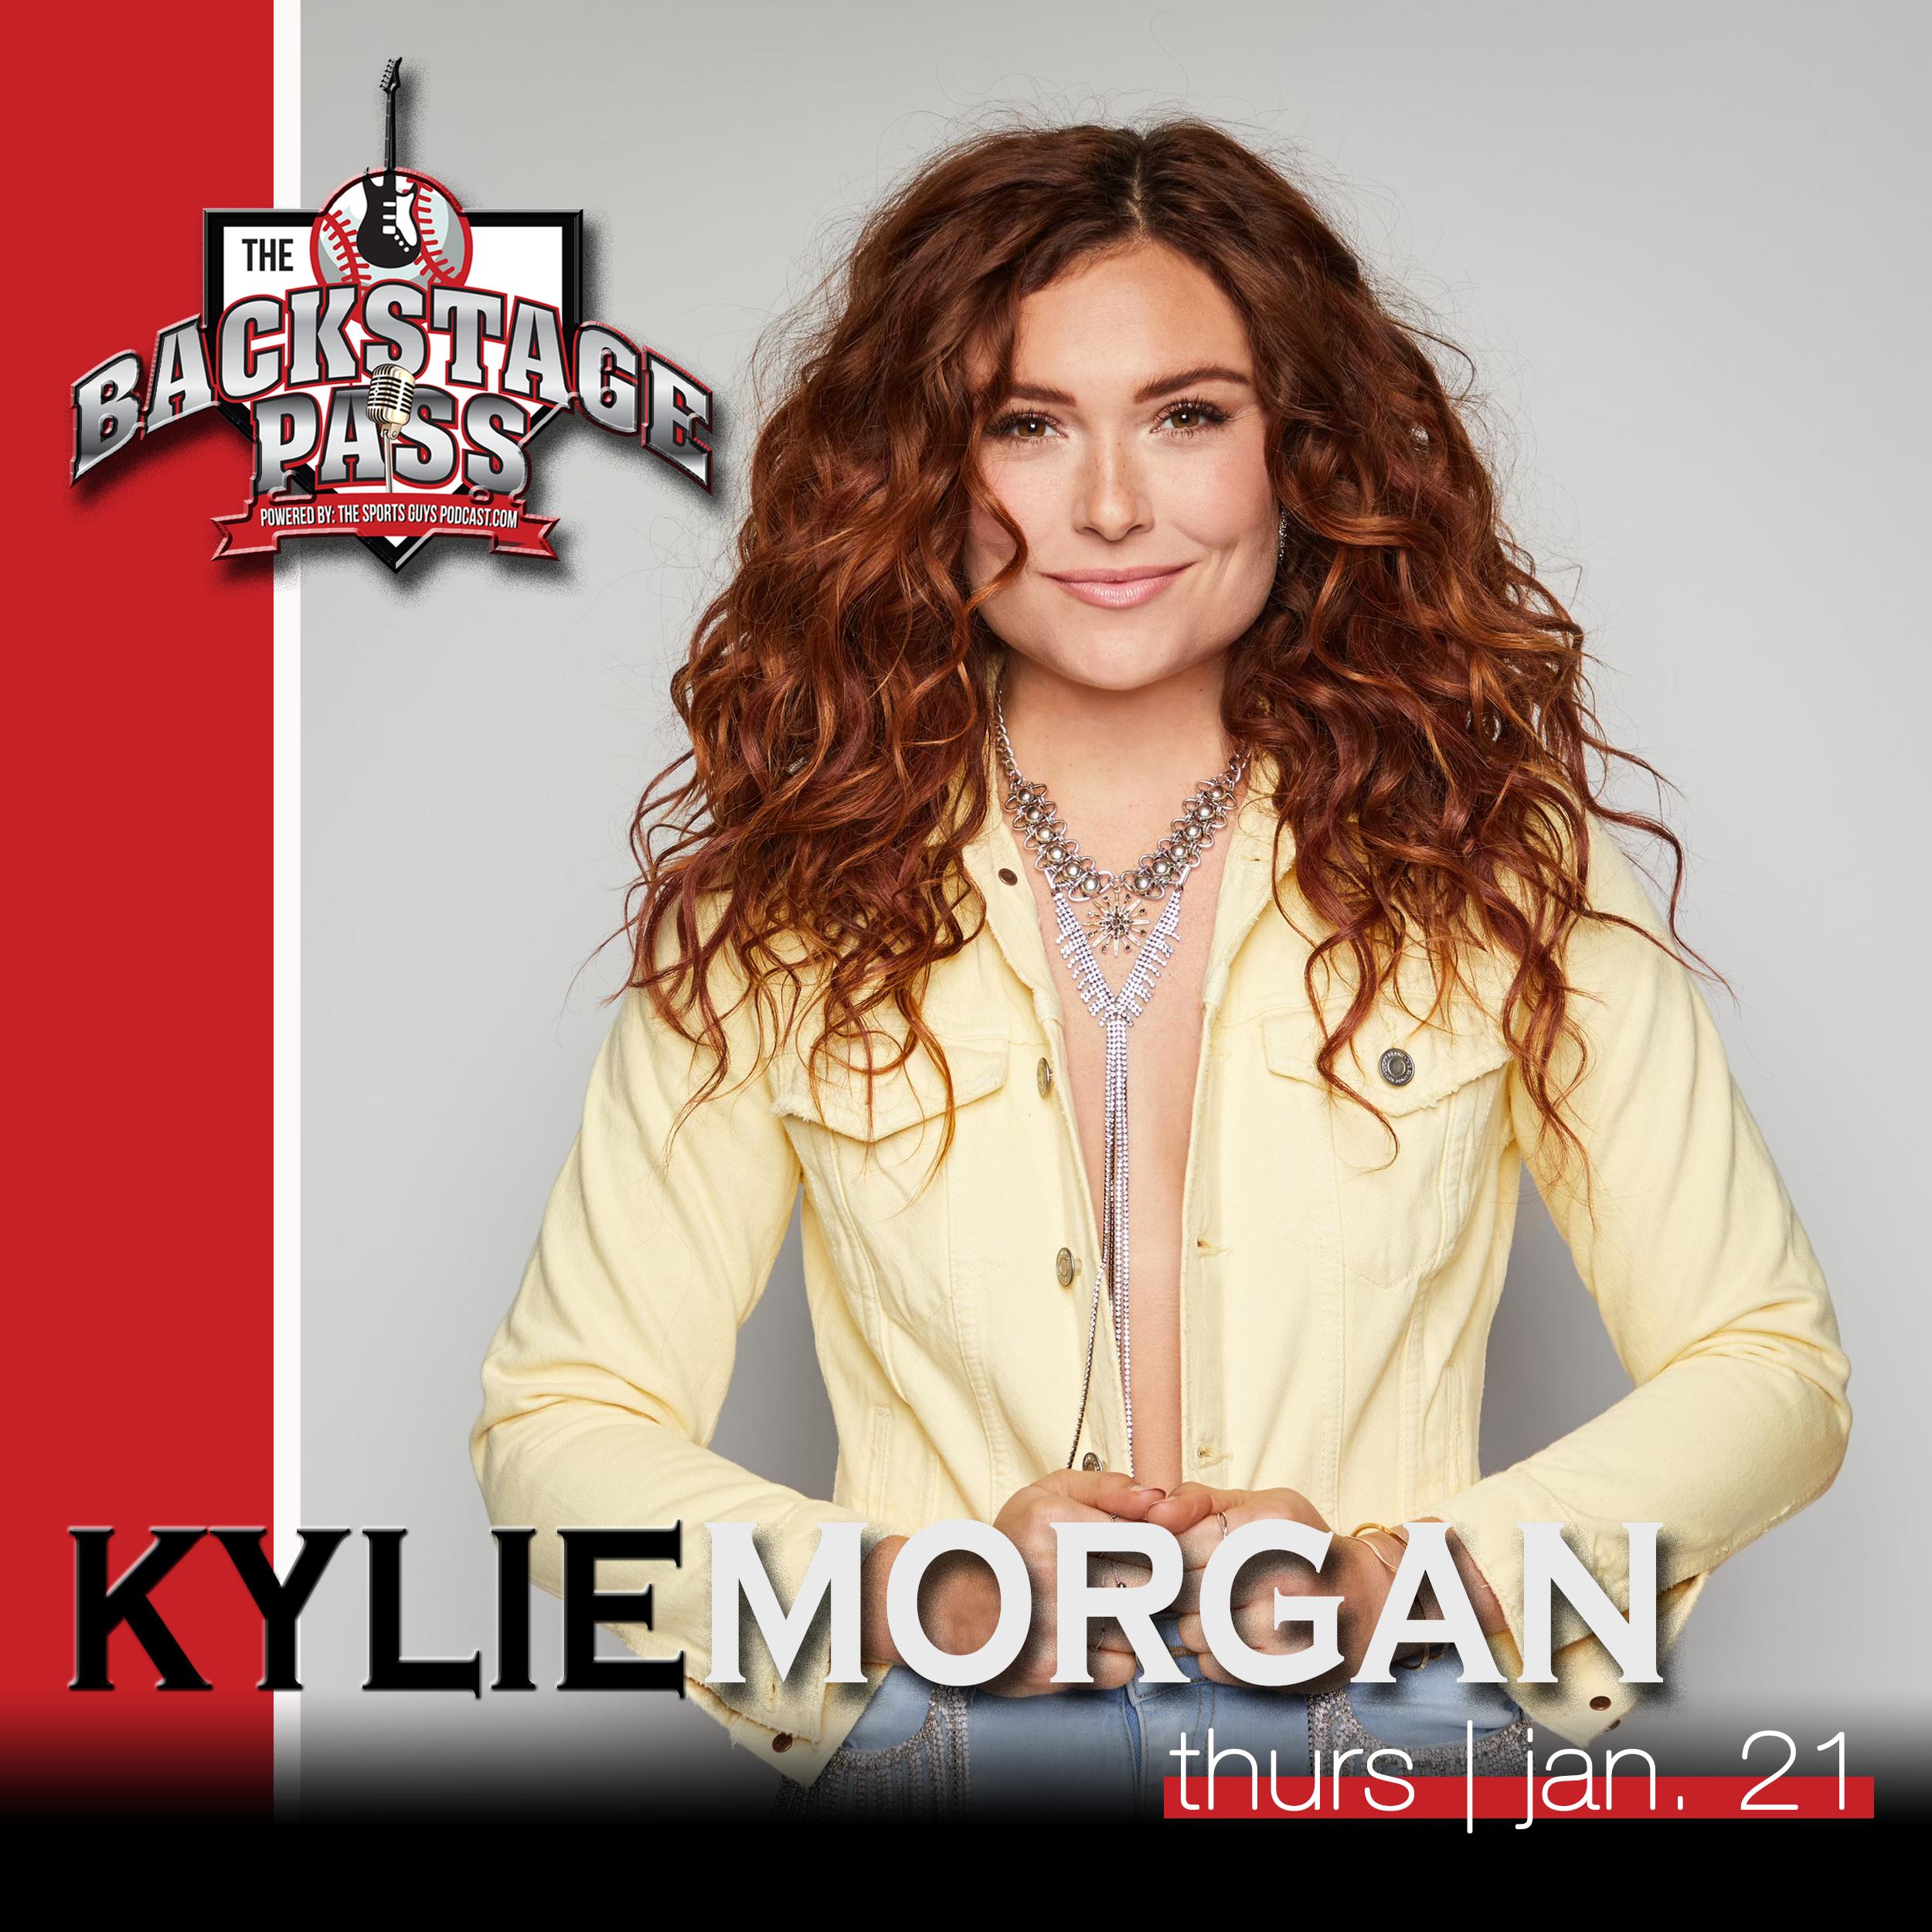 backstage_pass_kylie_morgan